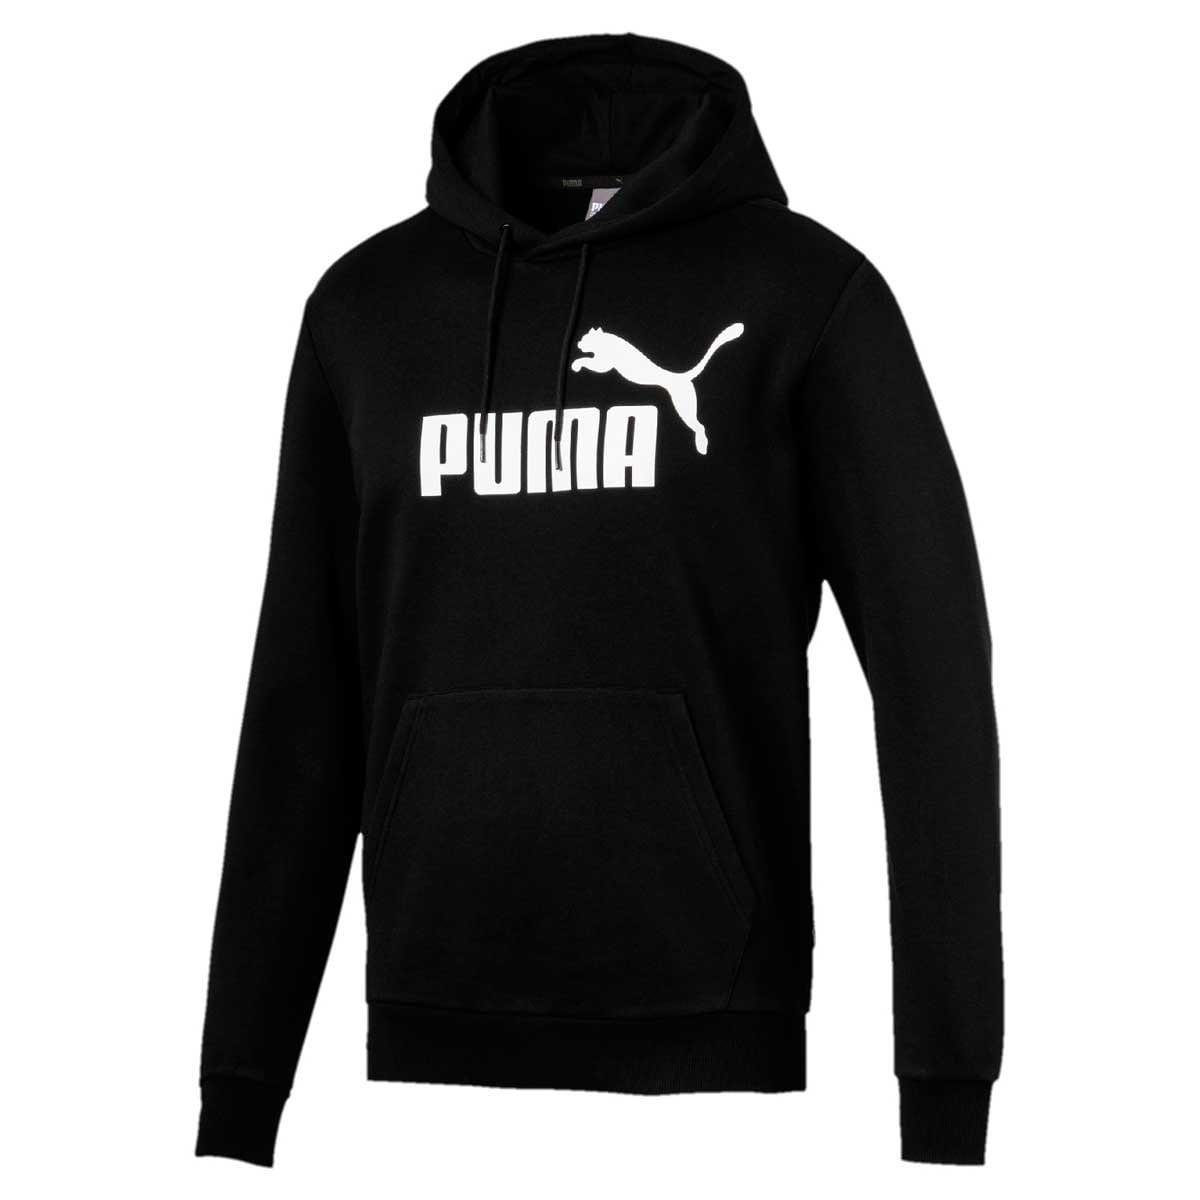 Sudadera Ess Hoody Fl Big Logo Puma - Caballero